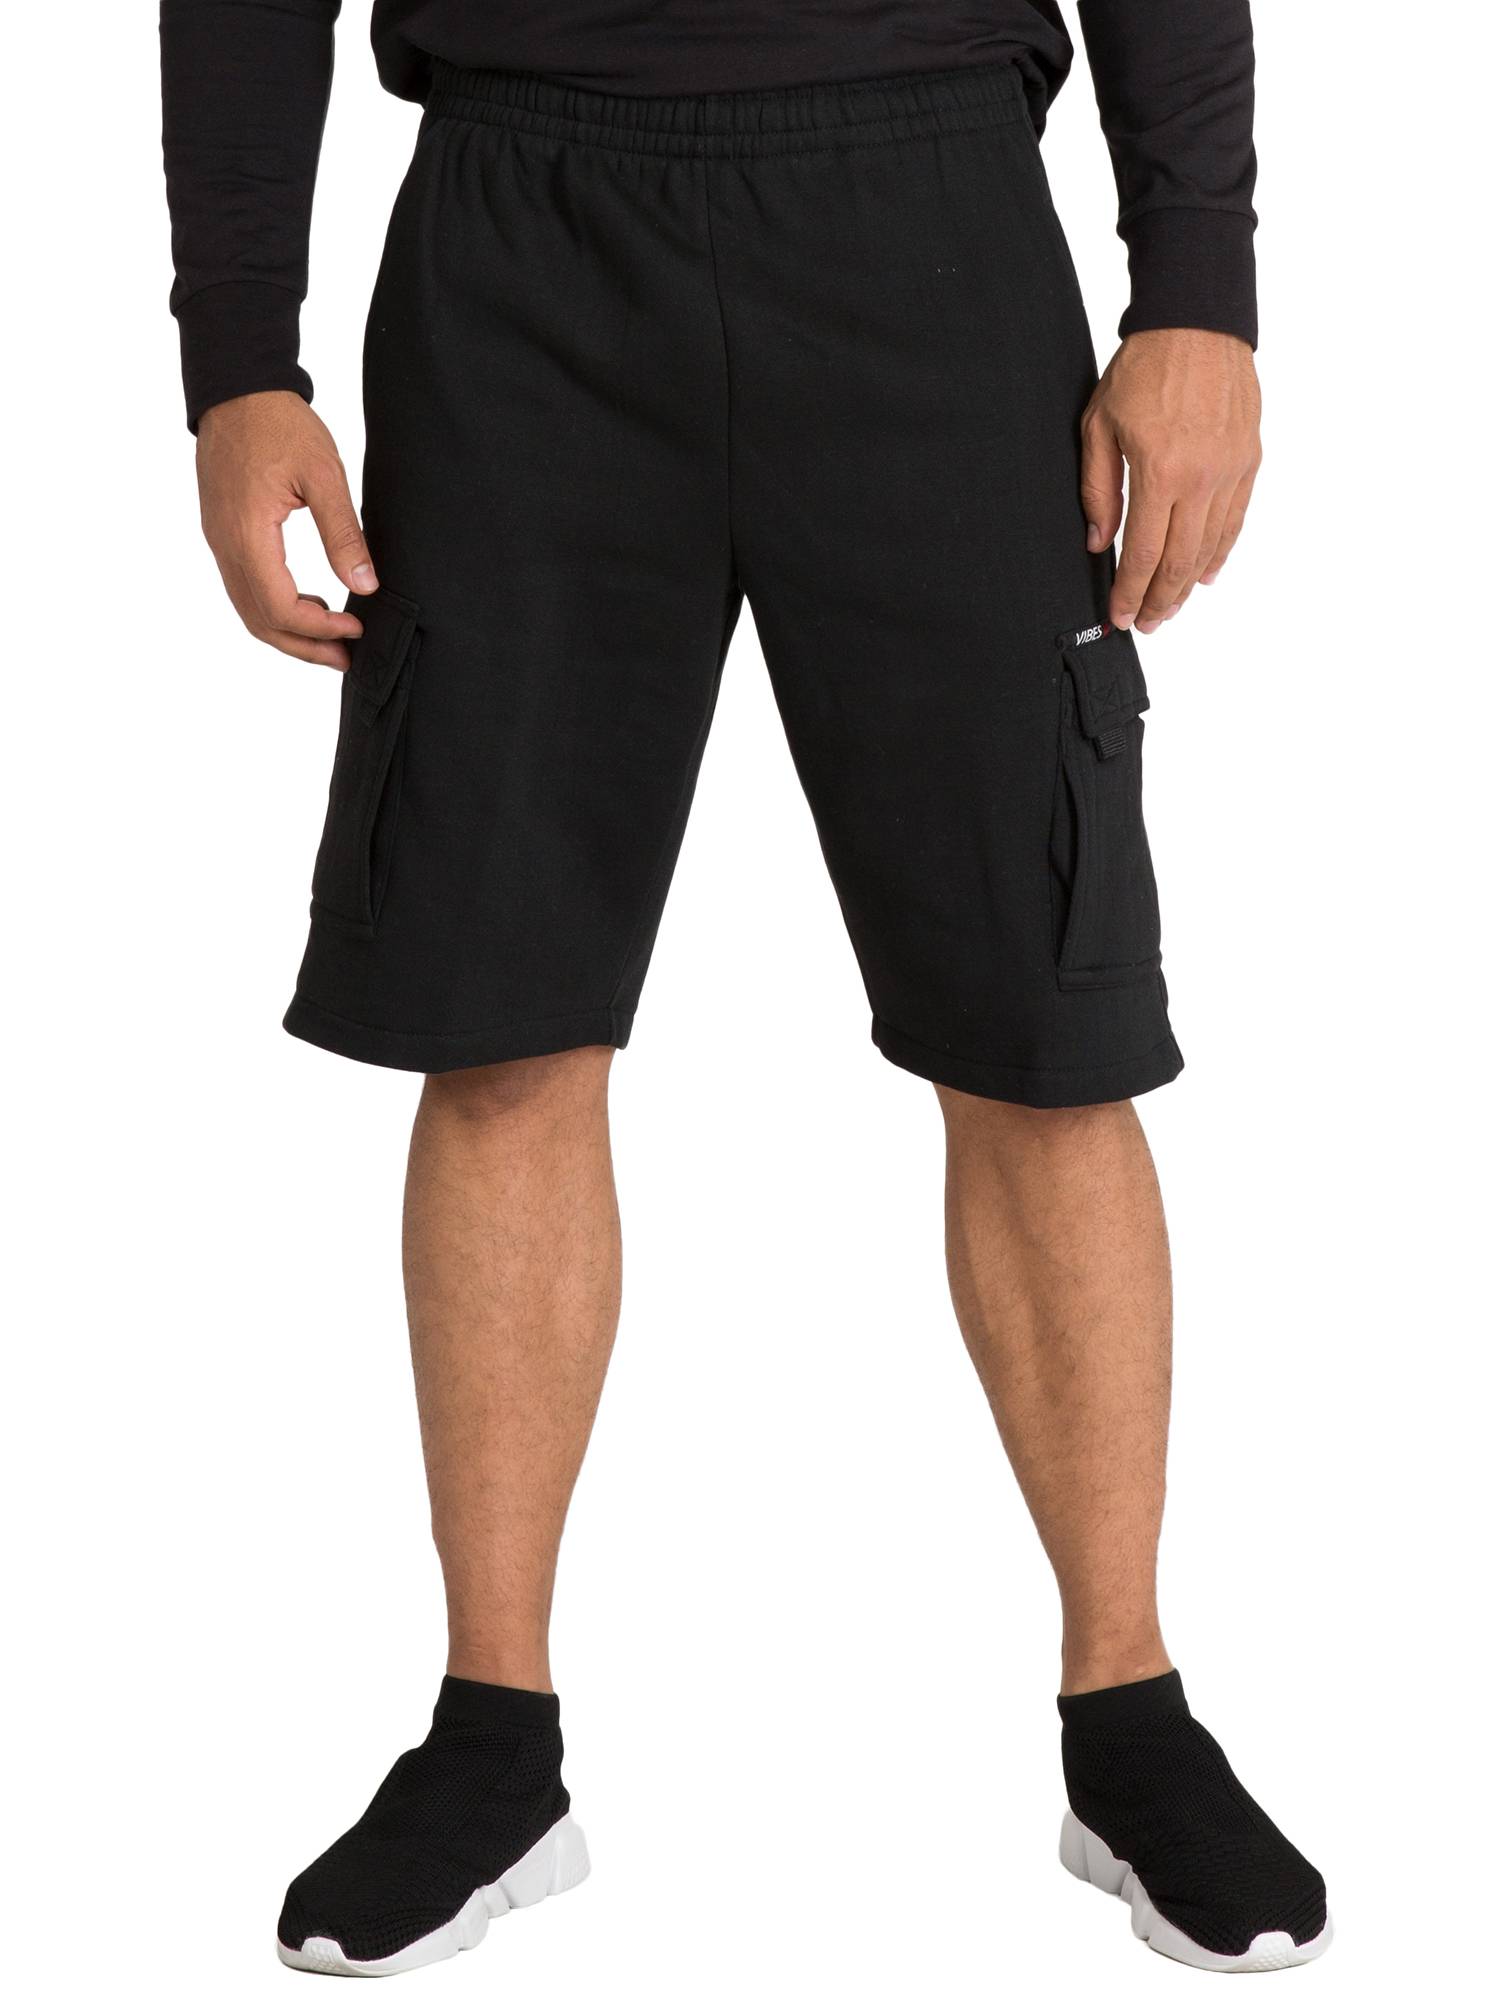 "Vibes Men's Celtic Fleece Relaxed Cargo Shorts 13"" Inseam Activewear"